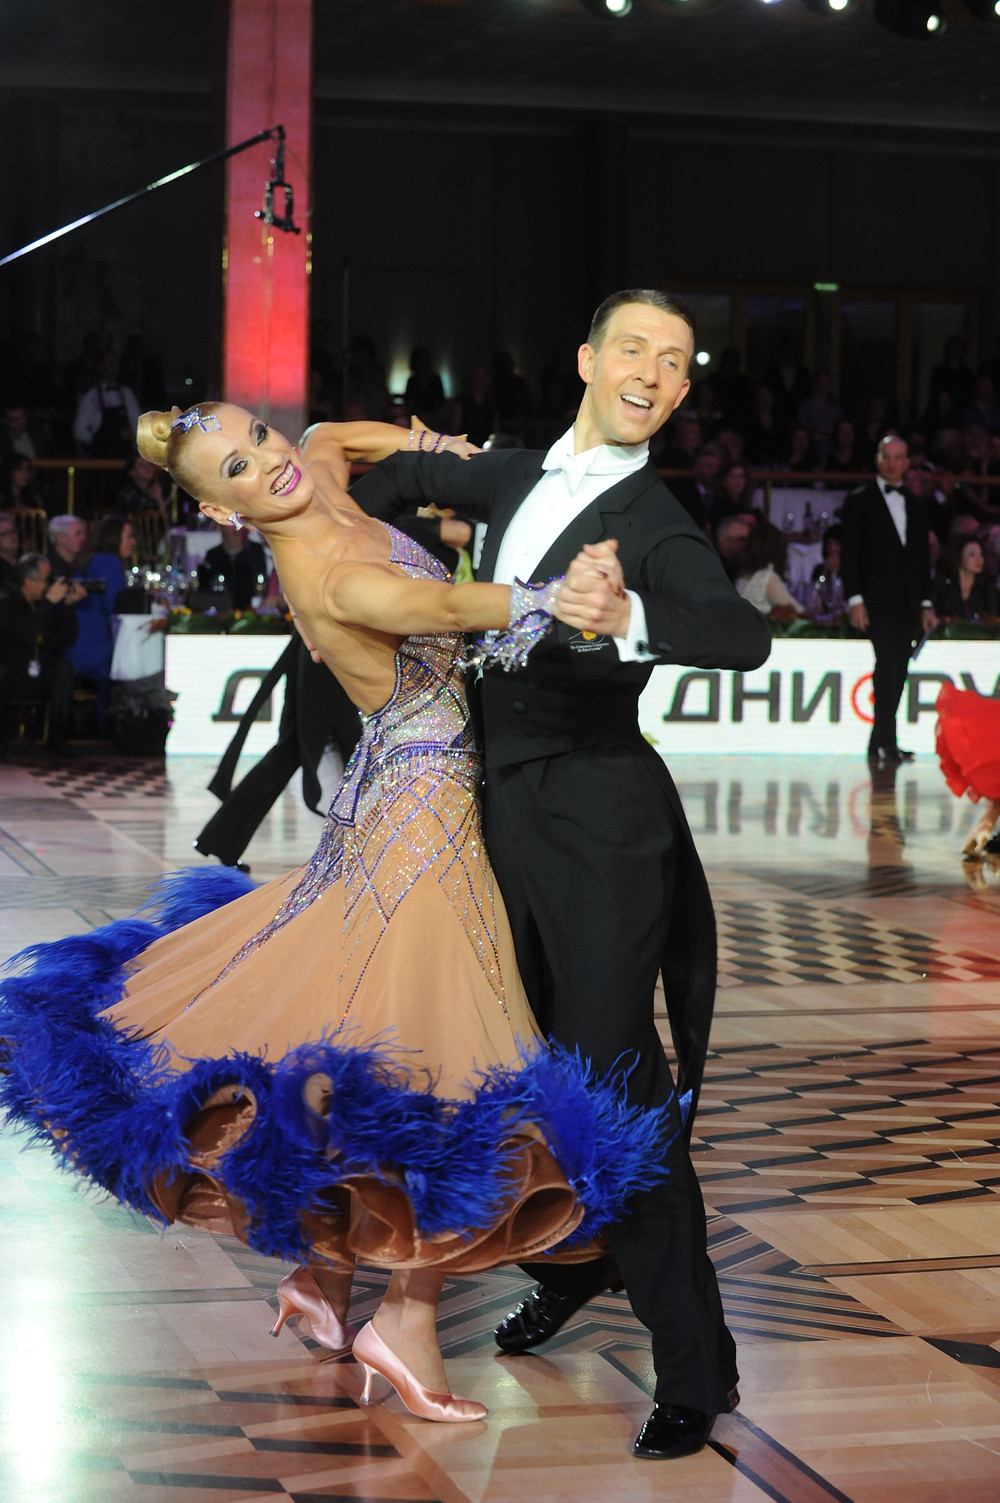 Арунас Бижокас и Катюша Демидова, фото Иван Иванович